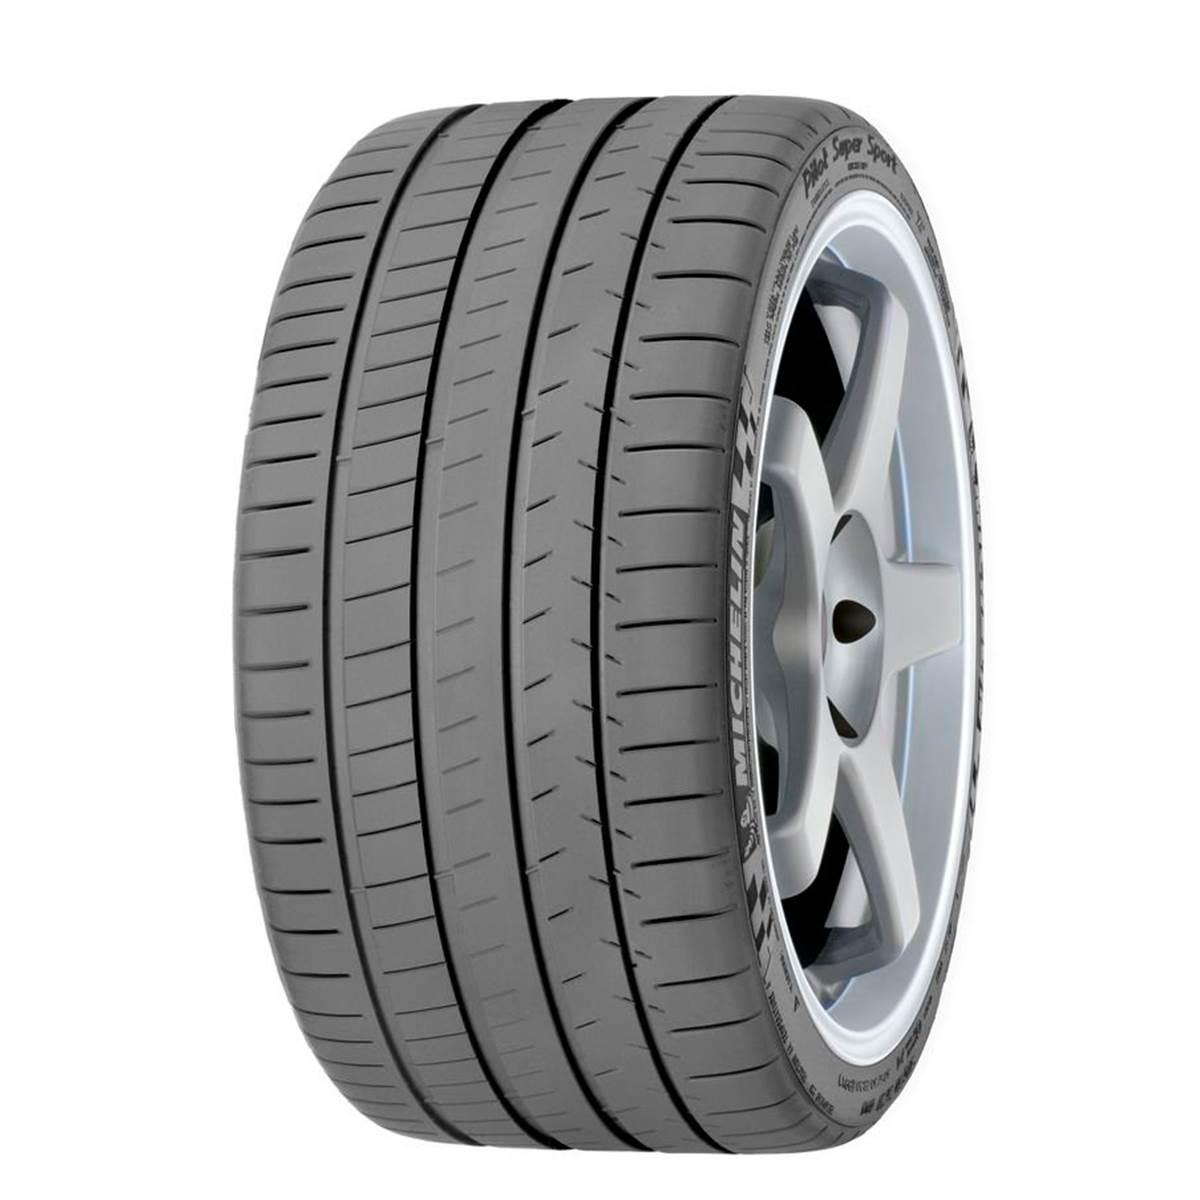 Pneu Michelin 255/40R18 99Y Pilot Super Sport XL